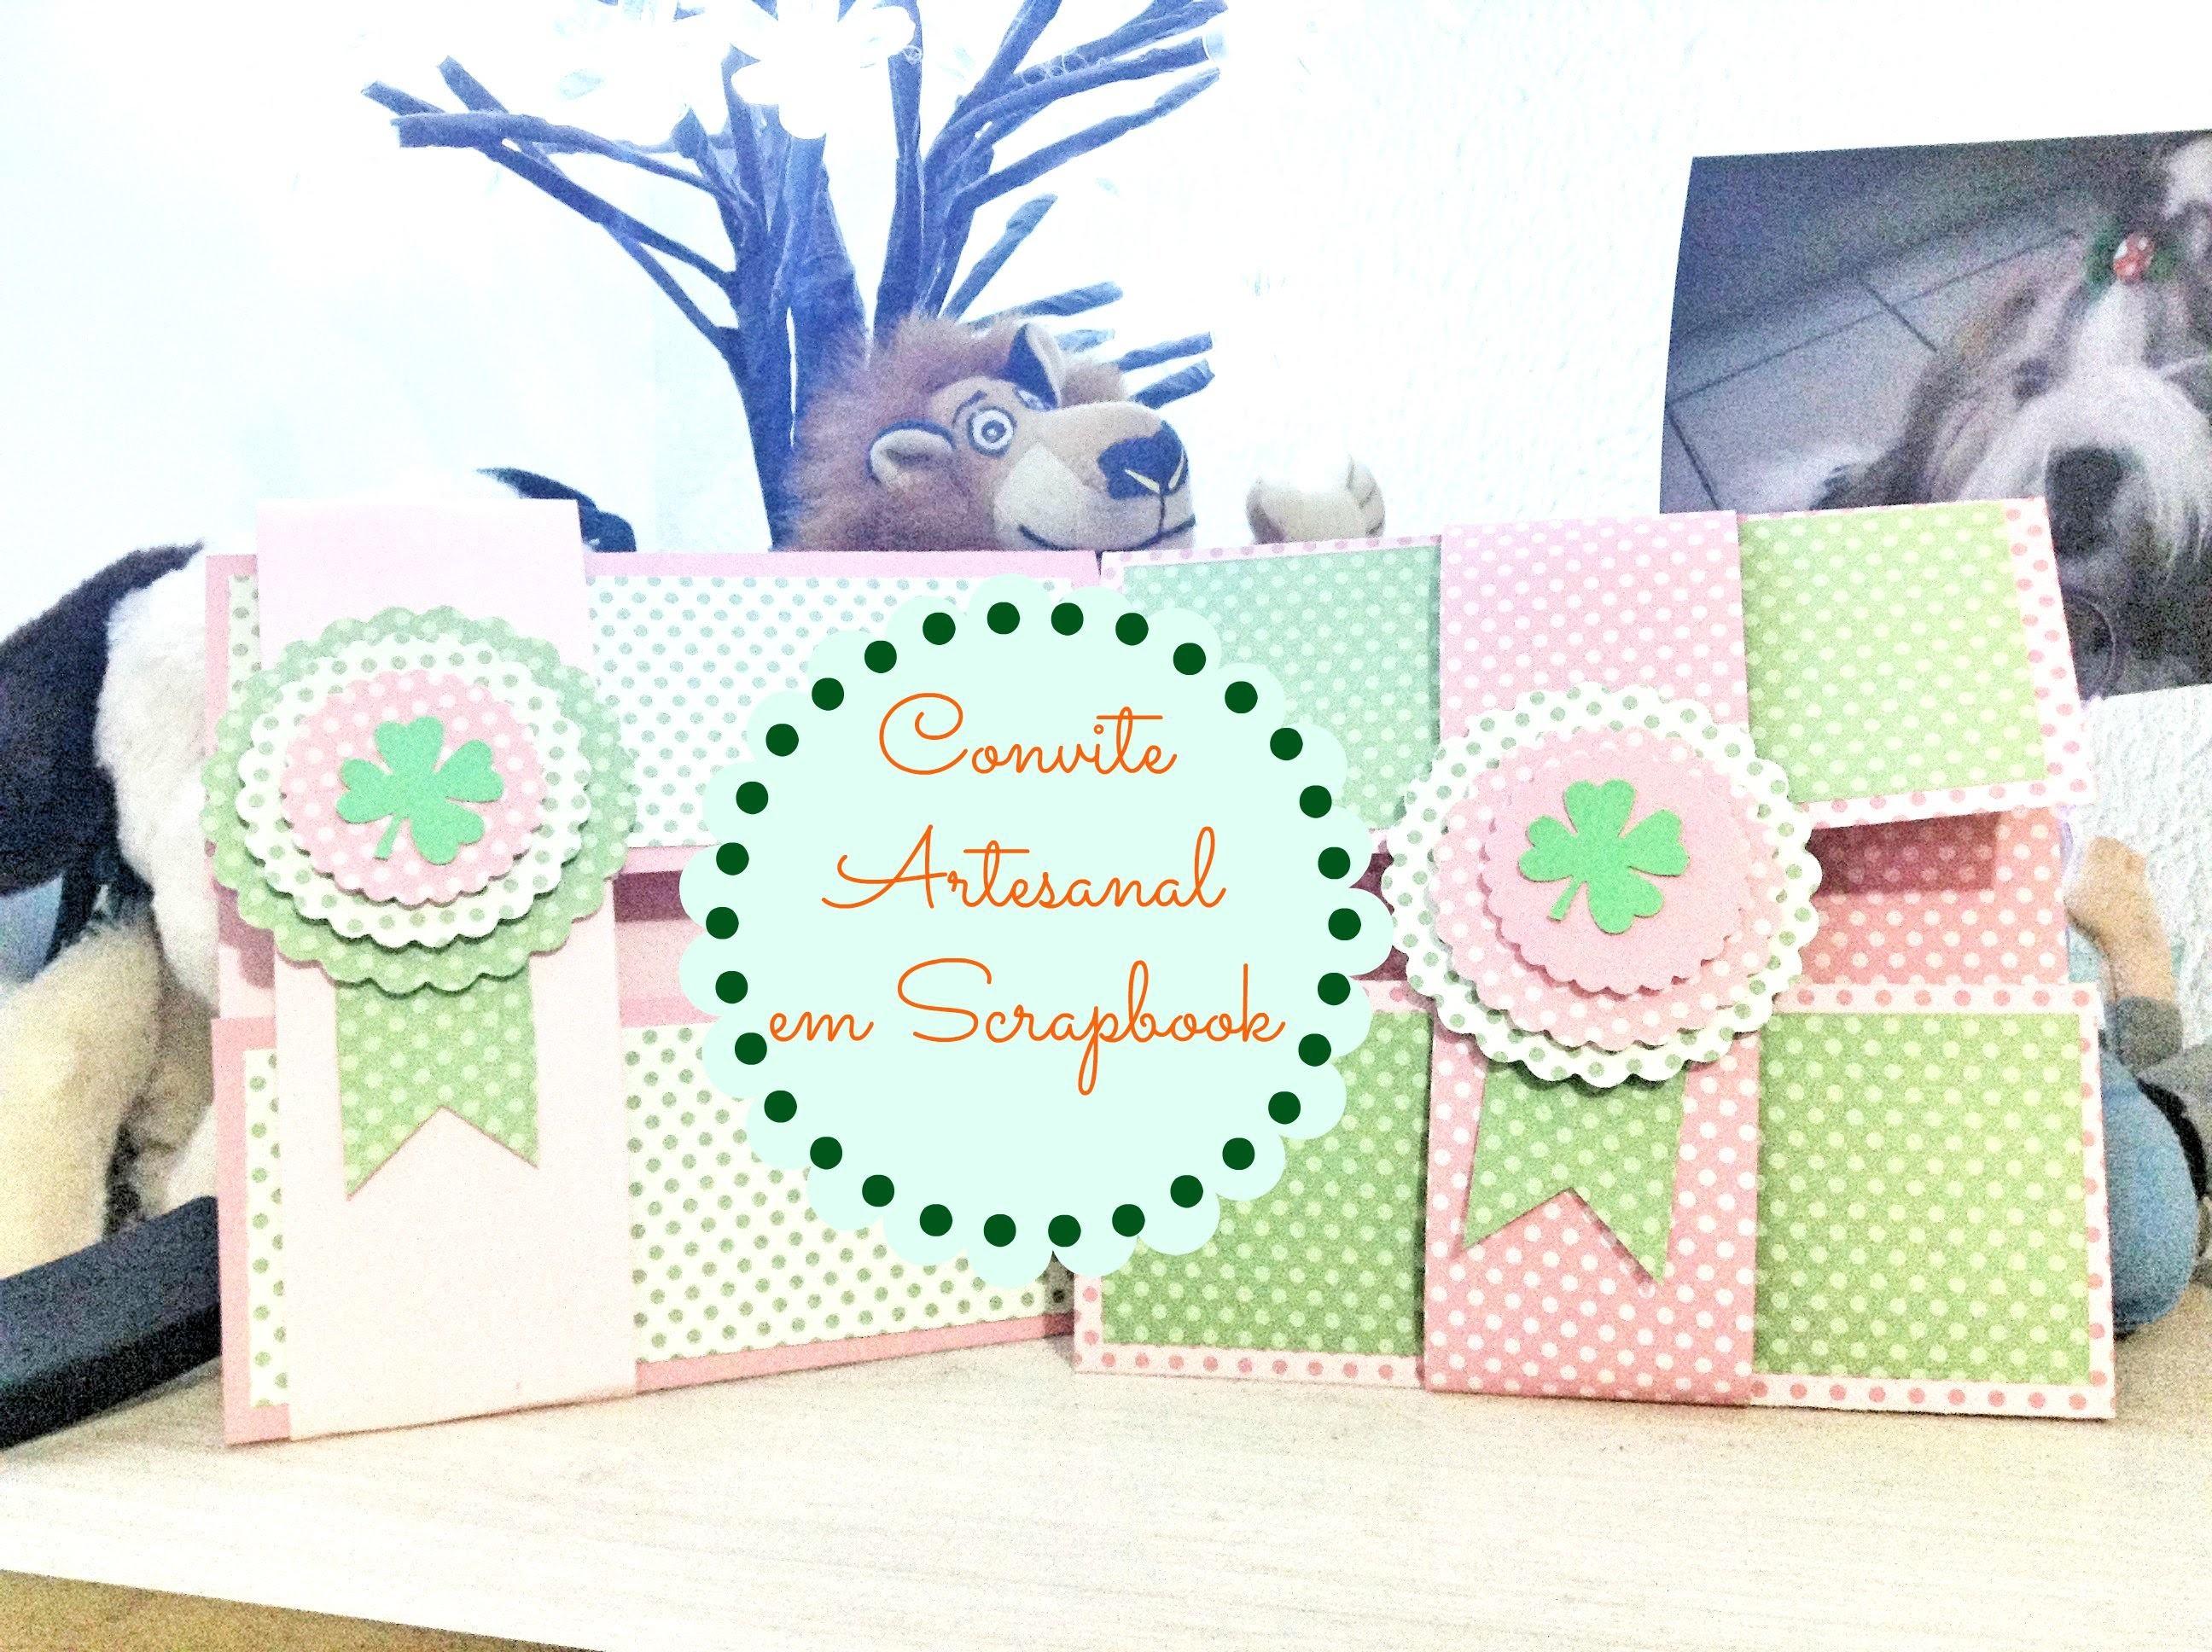 Convite Artesanal em Scrapbook